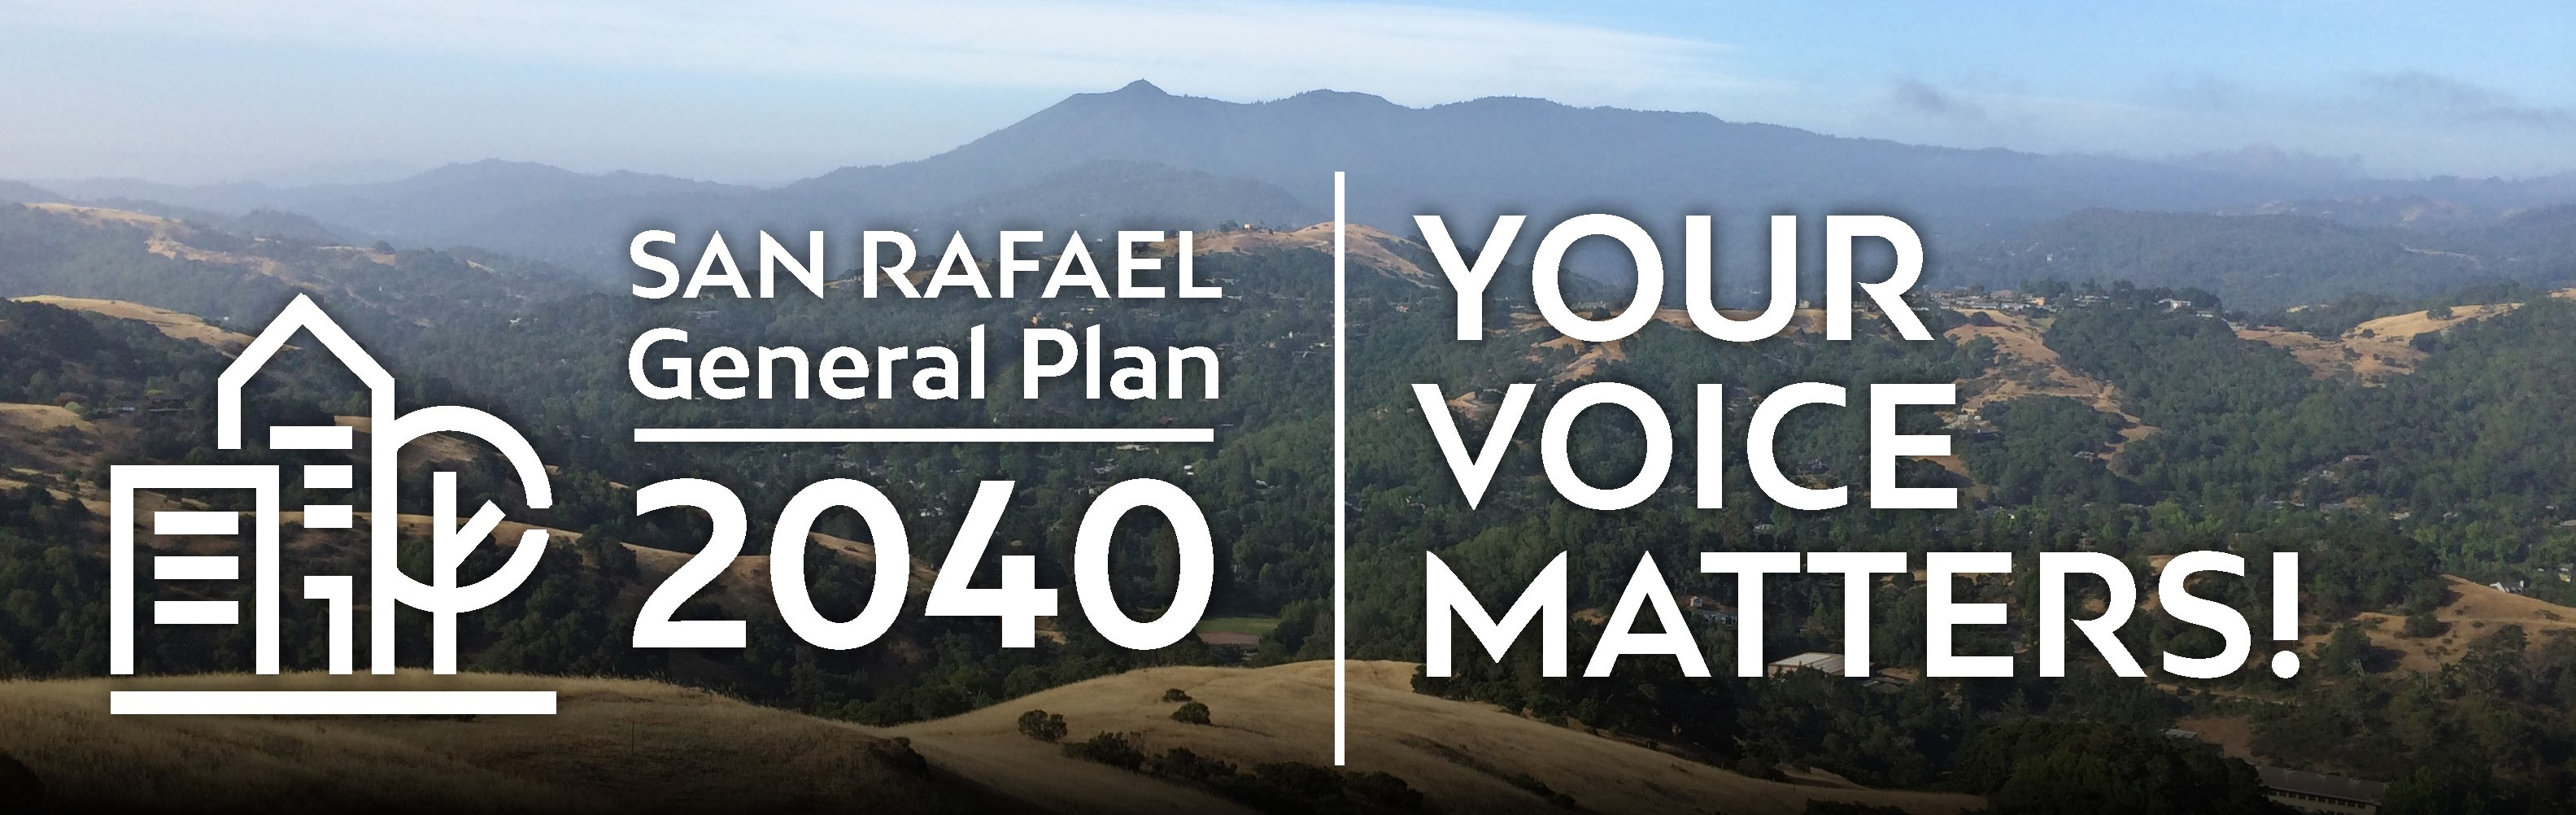 General Plan 2040 Header